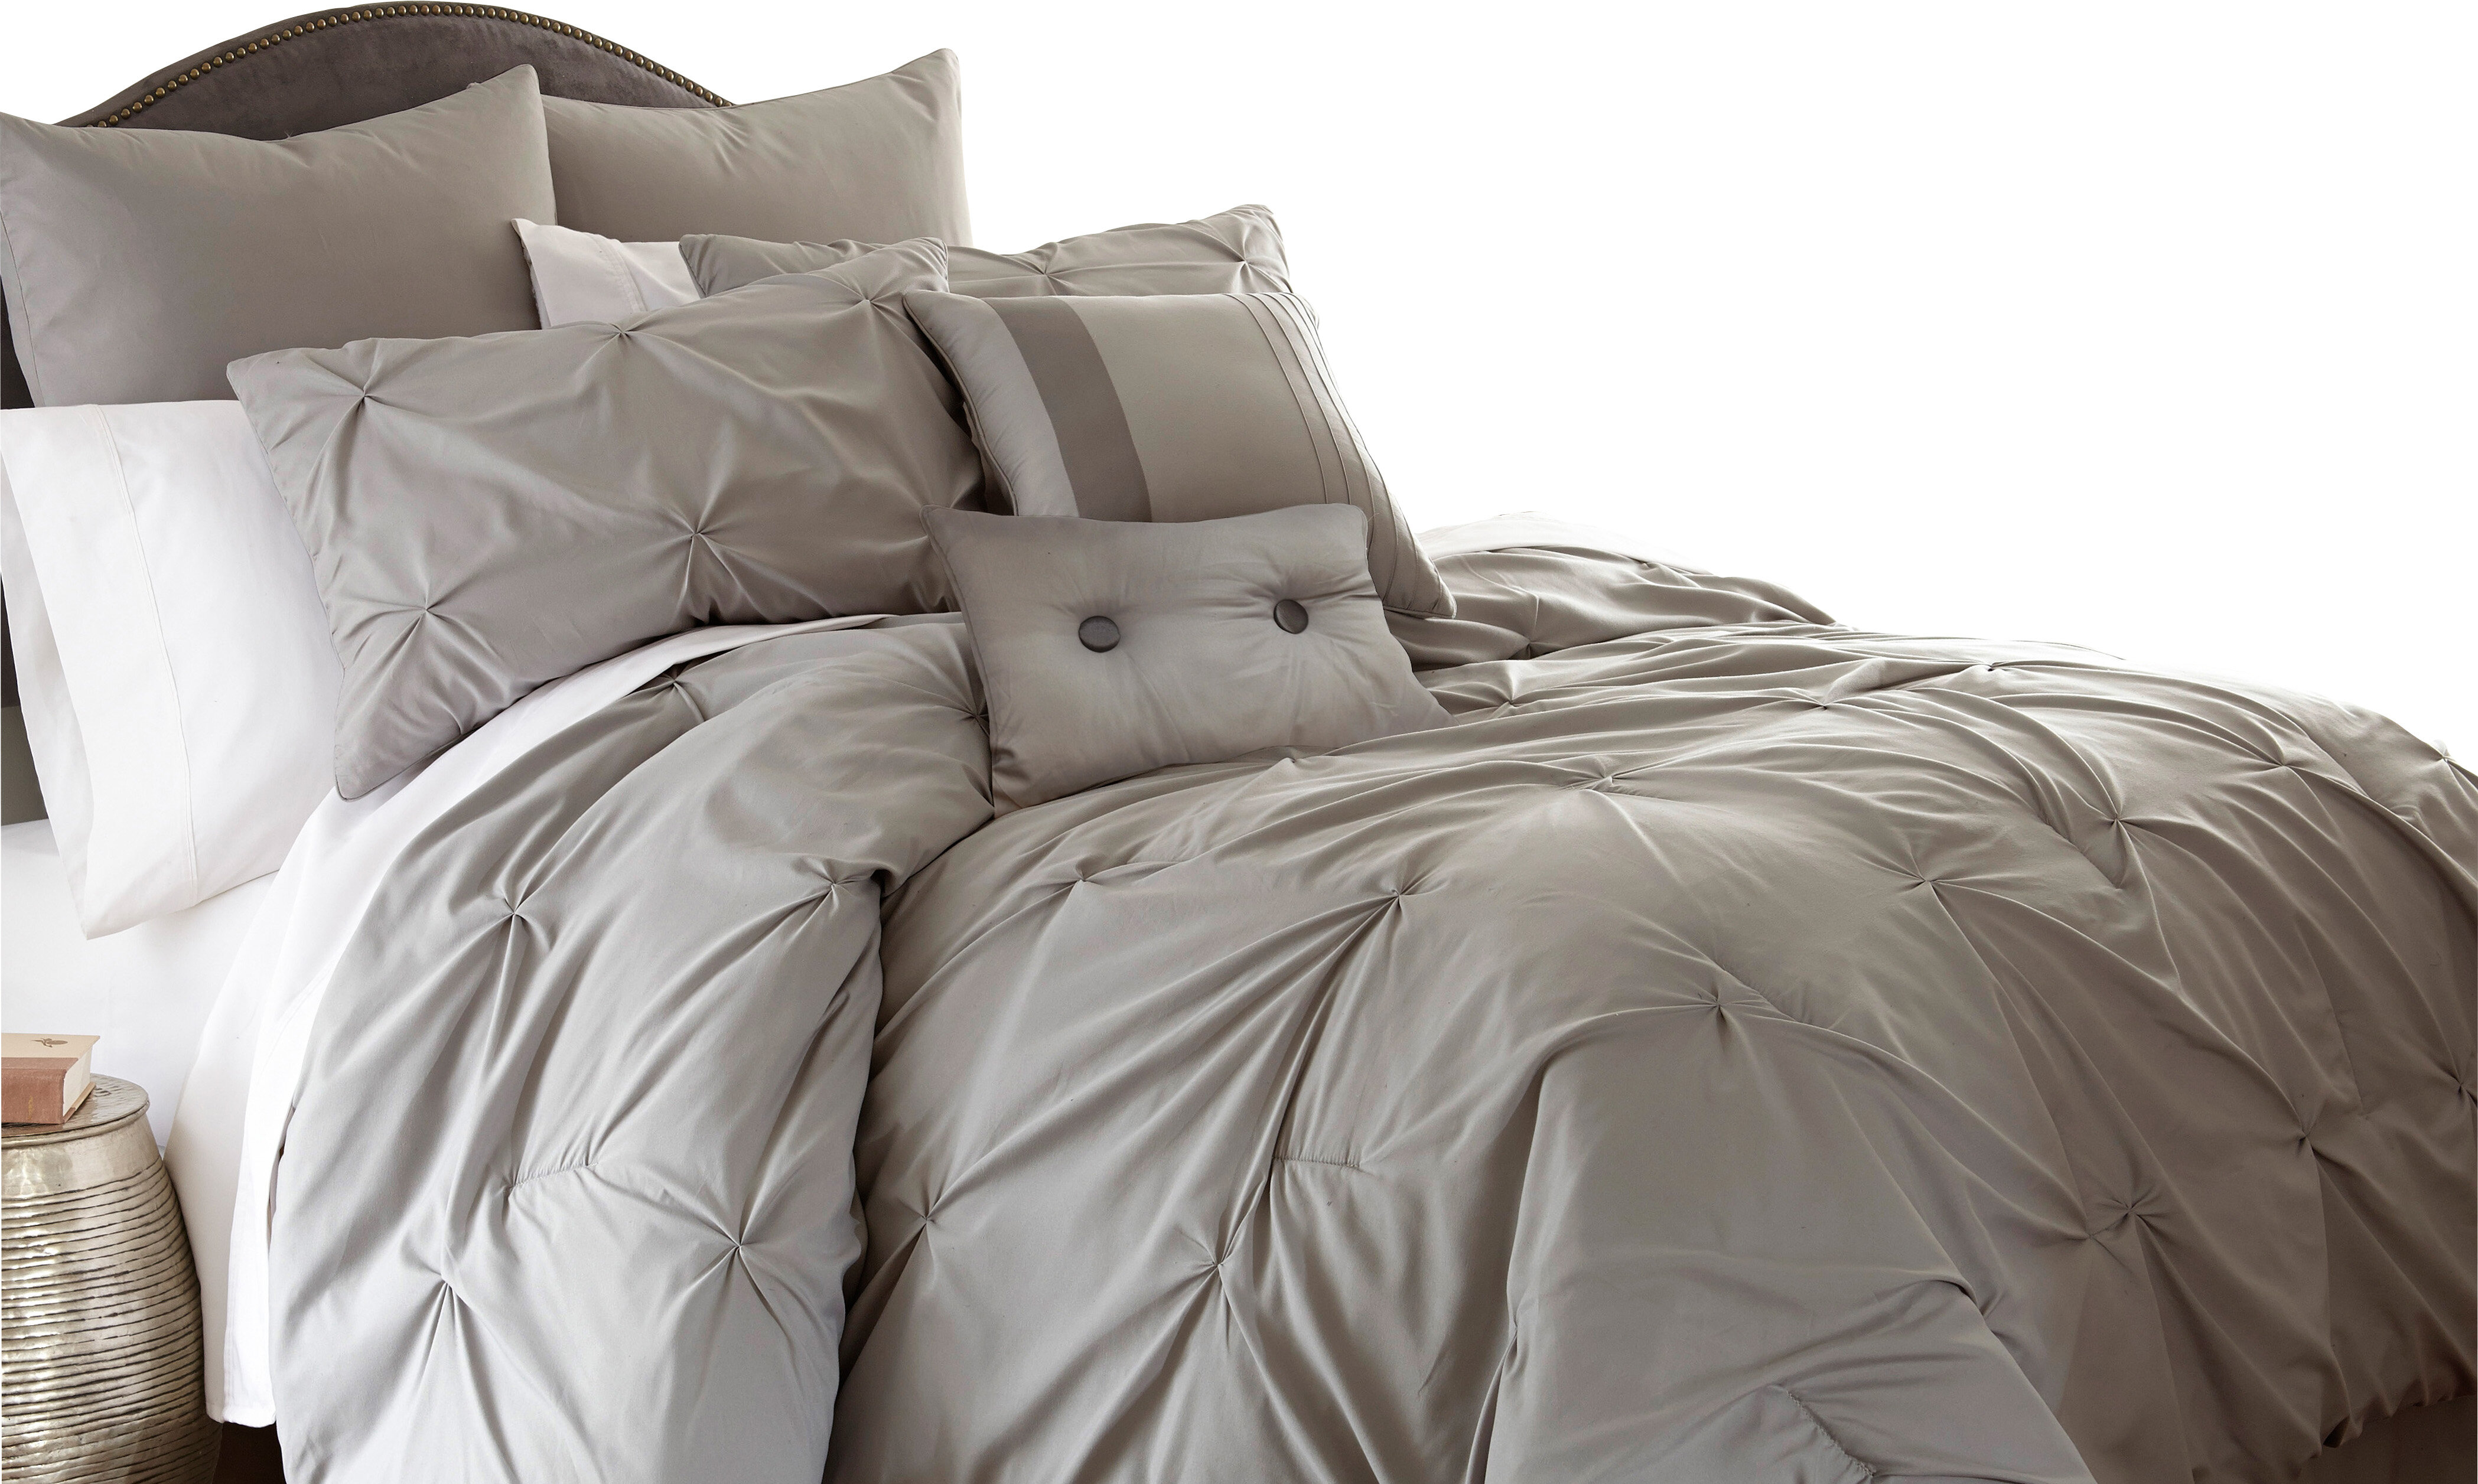 comforter paprika sets linens set queen bedding damask by linen